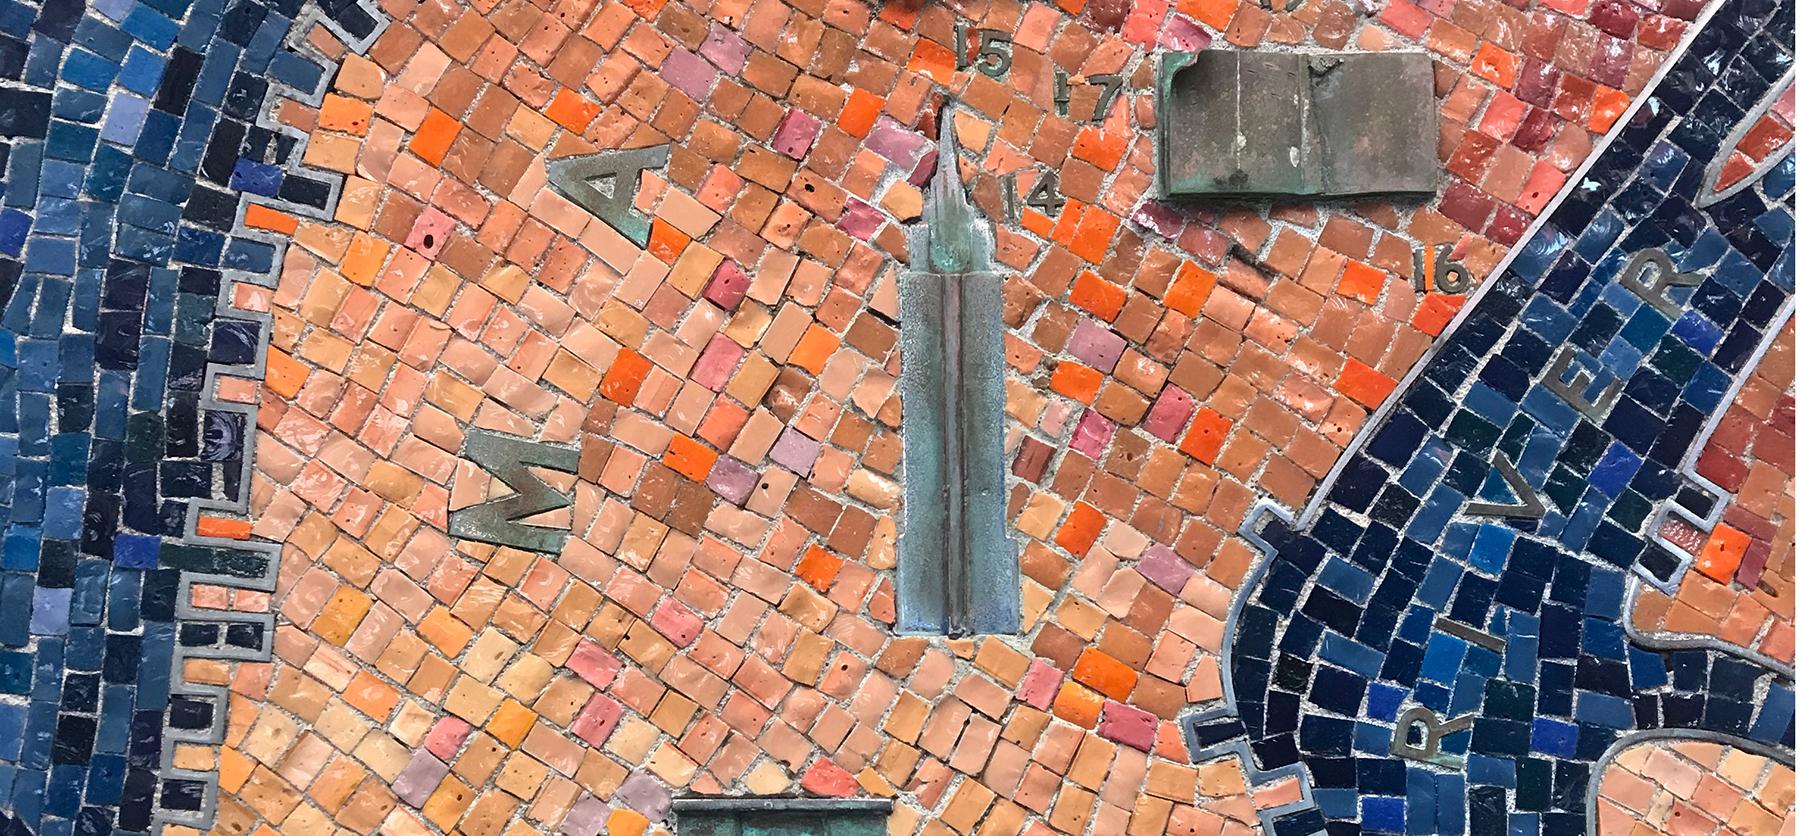 New York mosaic